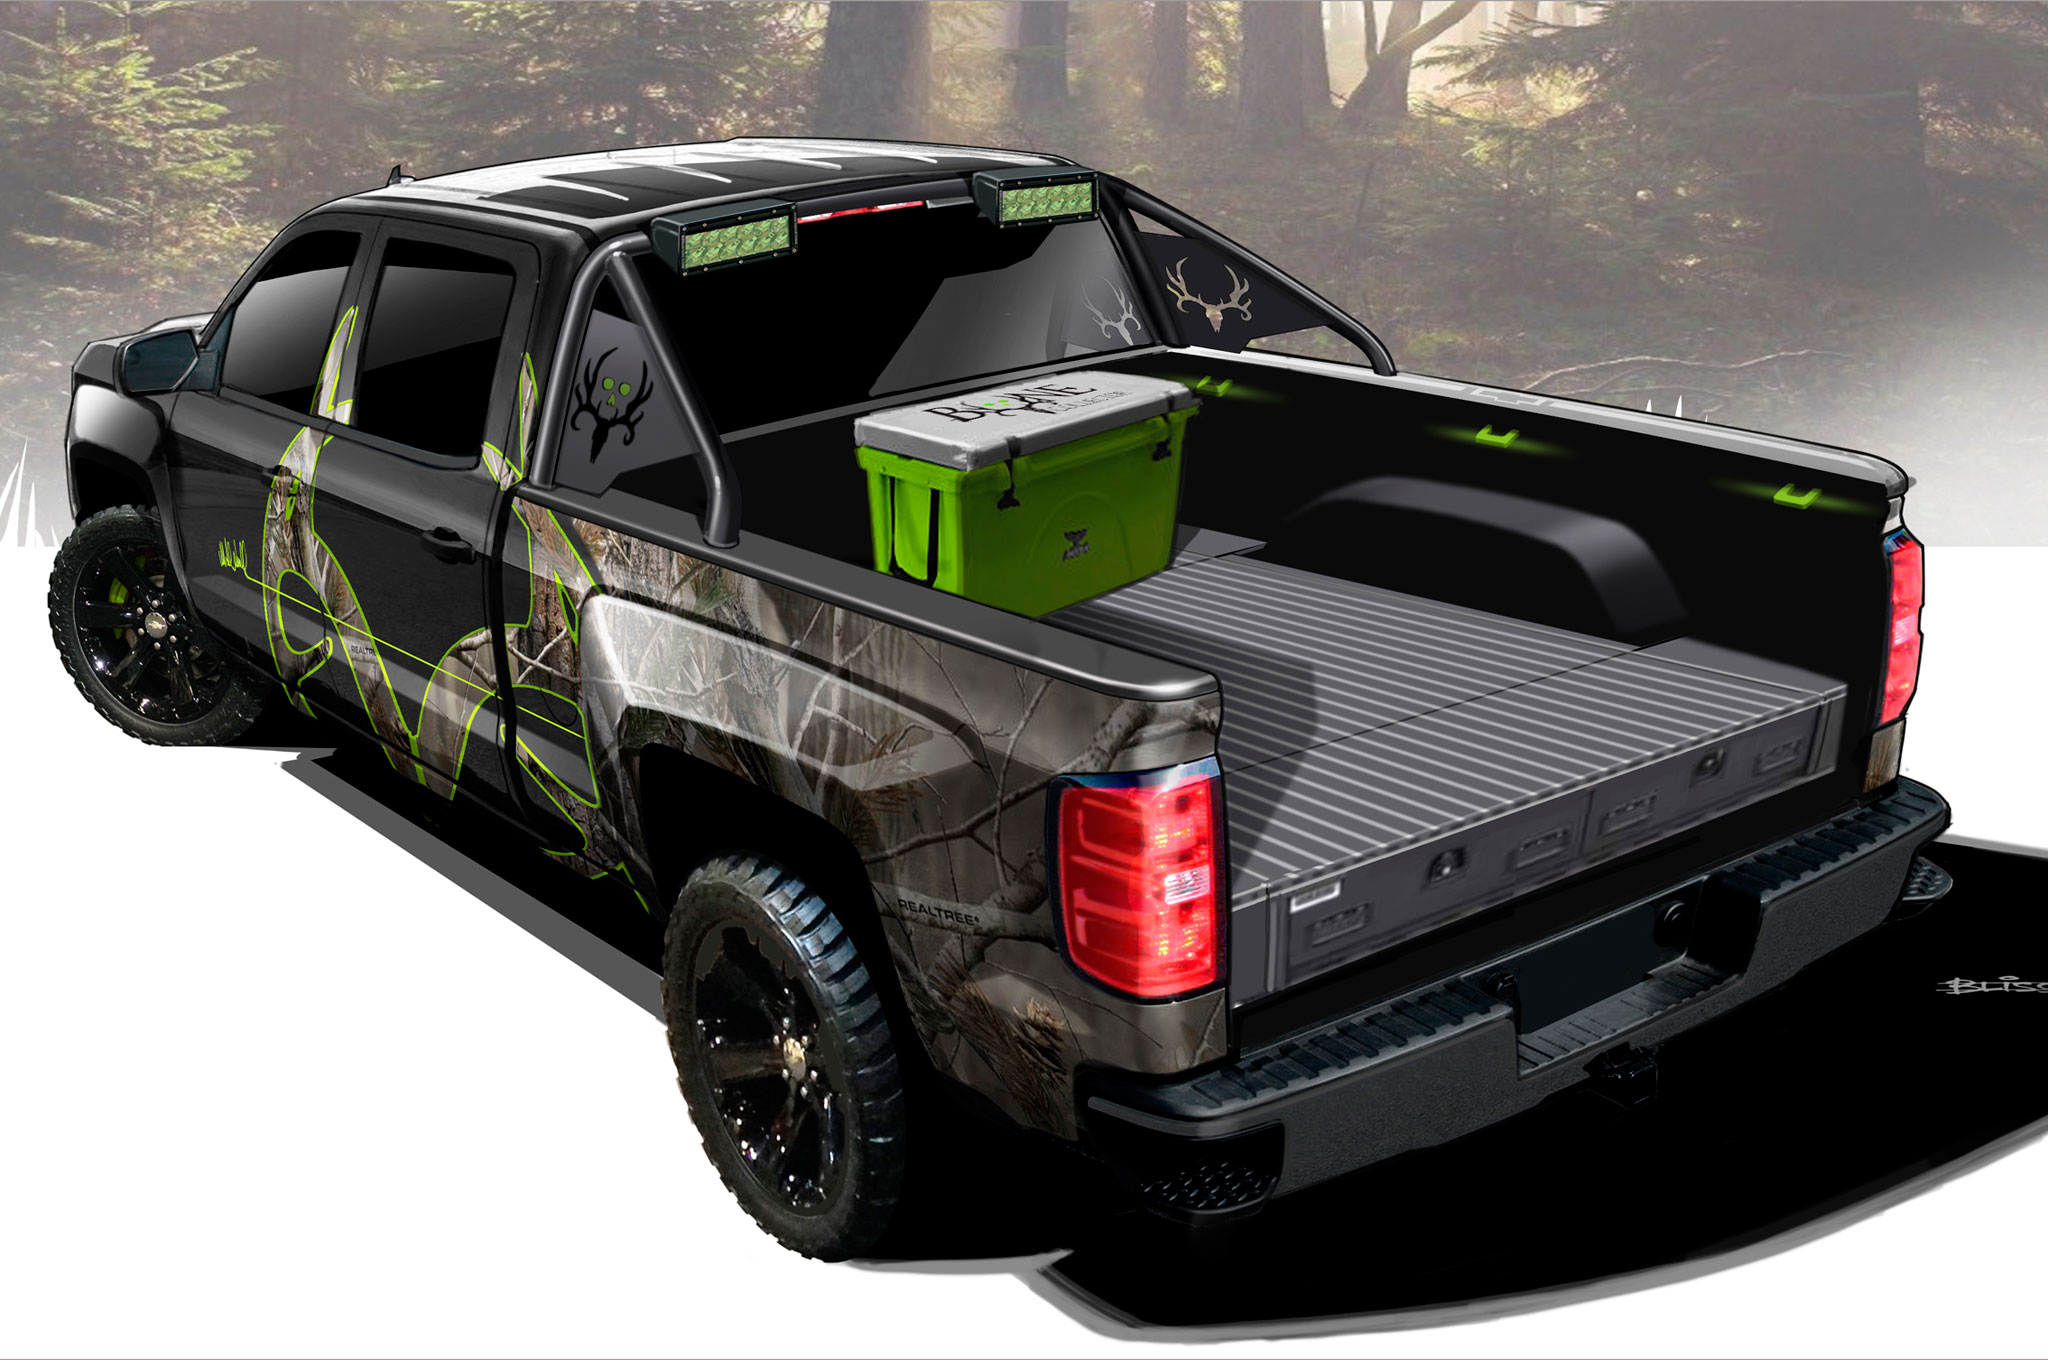 2016 Chevrolet Silverado Adds Hunting-Inspired Realtree ...